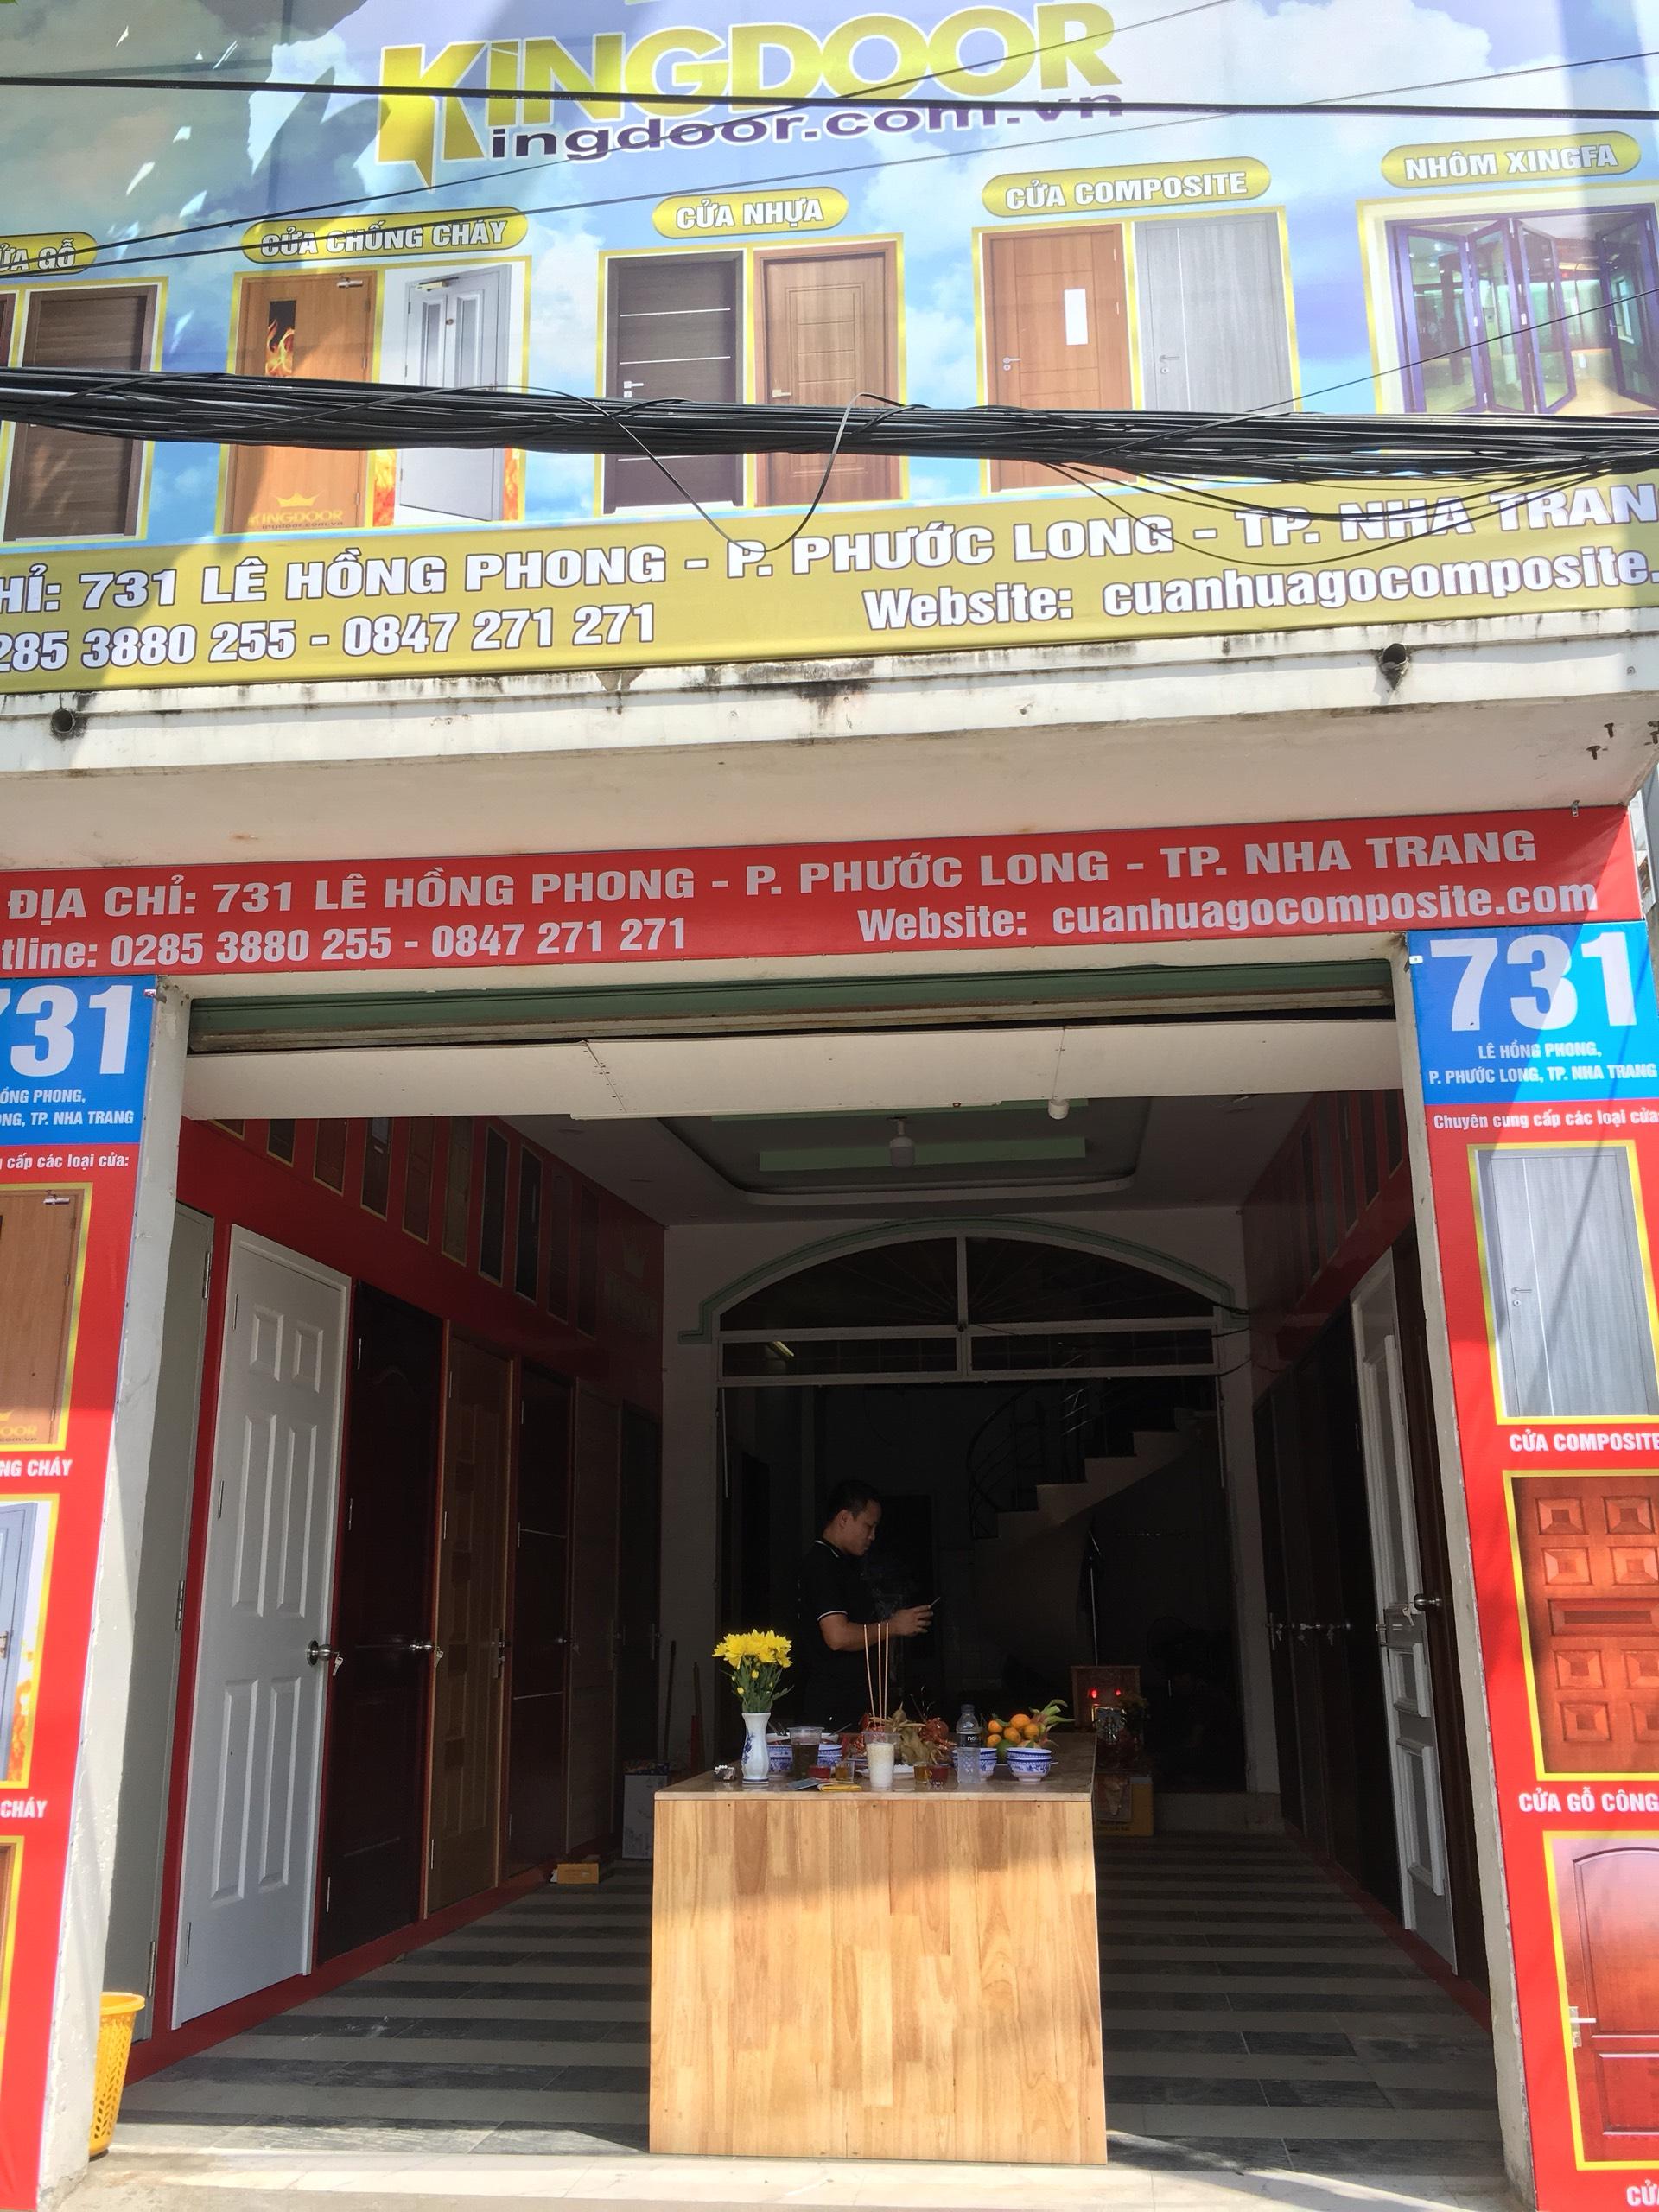 Địa chỉ Showroom Kingdoor tại Nha Trang